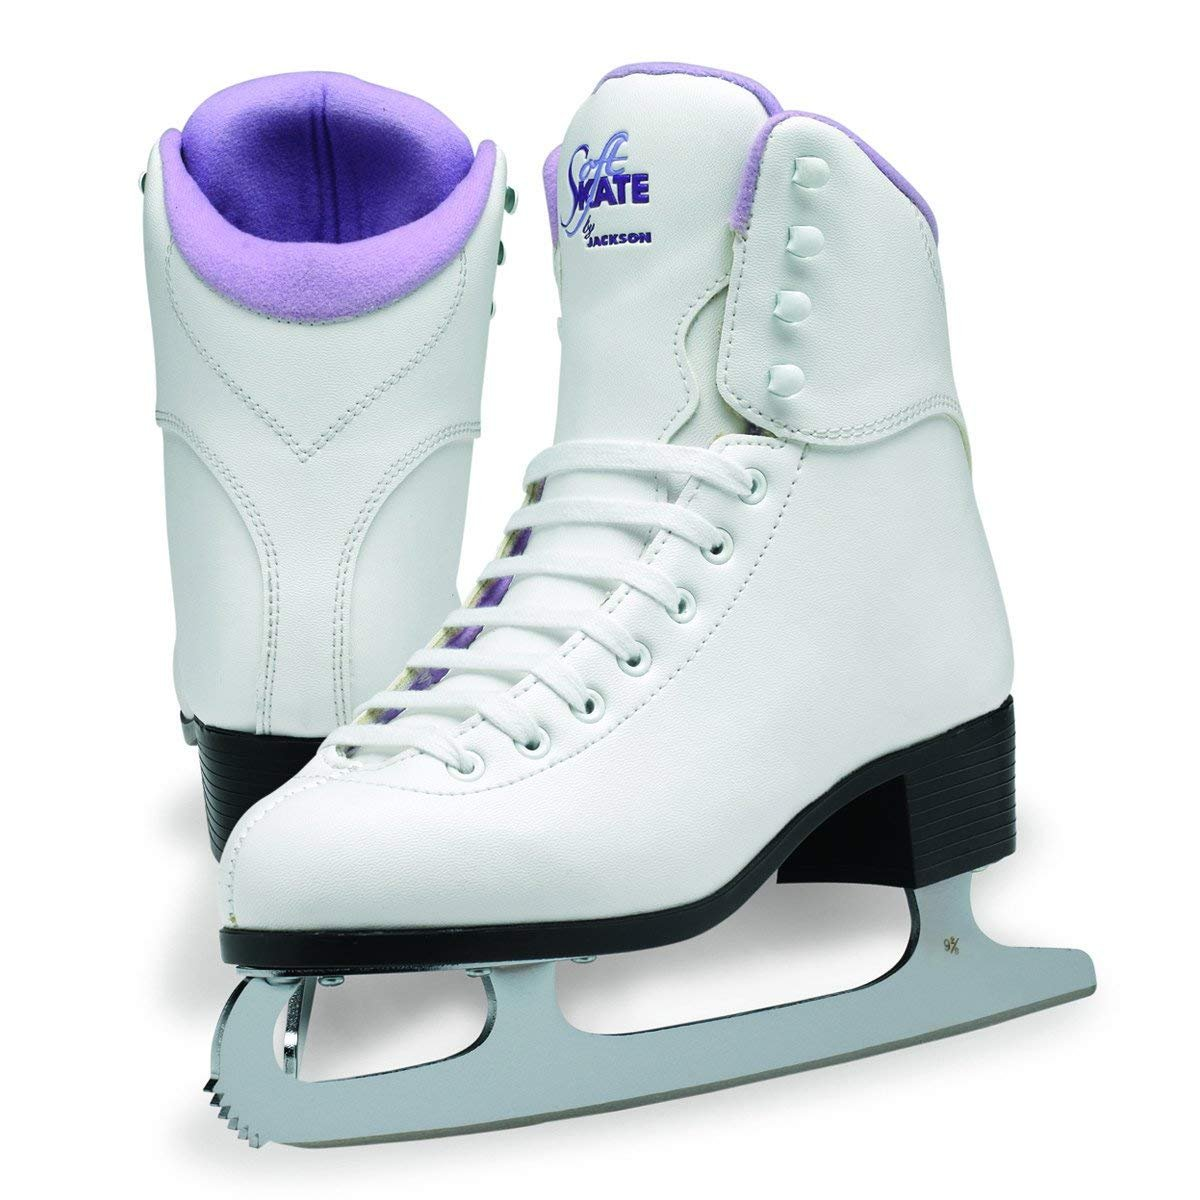 Jackson Ultima GS181 Misses Figure Skates - Size 3 Junior